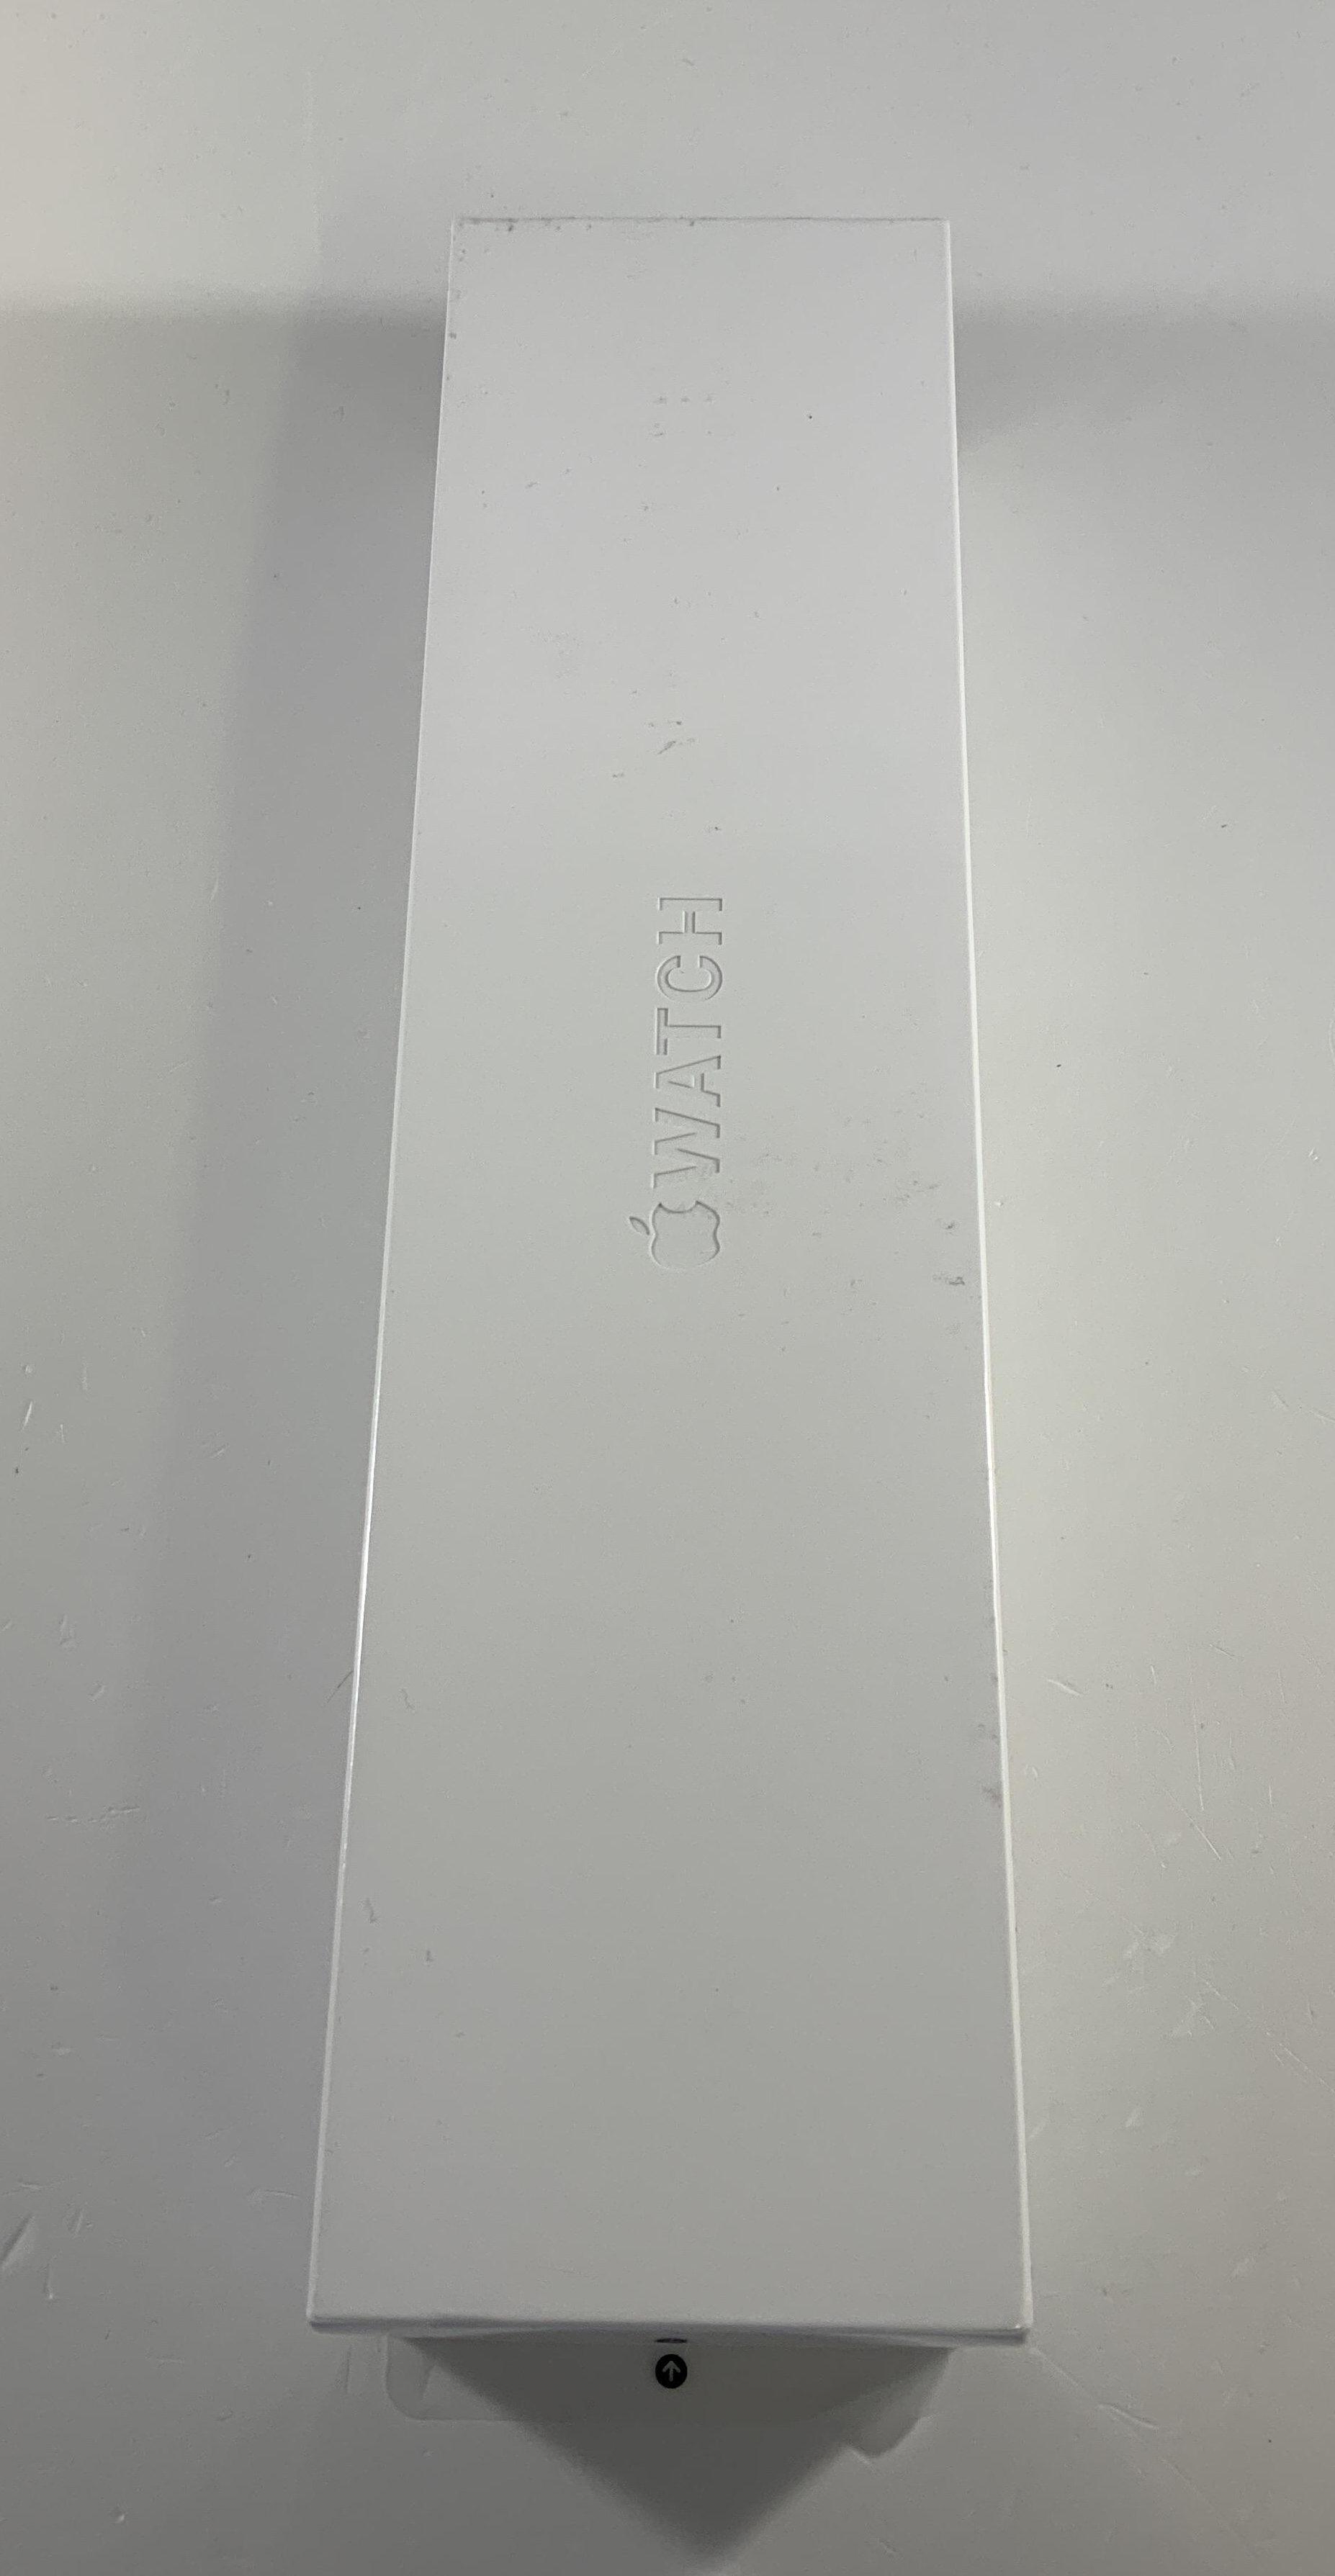 Watch Series 5 Steel Cellular (40mm), Space Black, Kuva 2